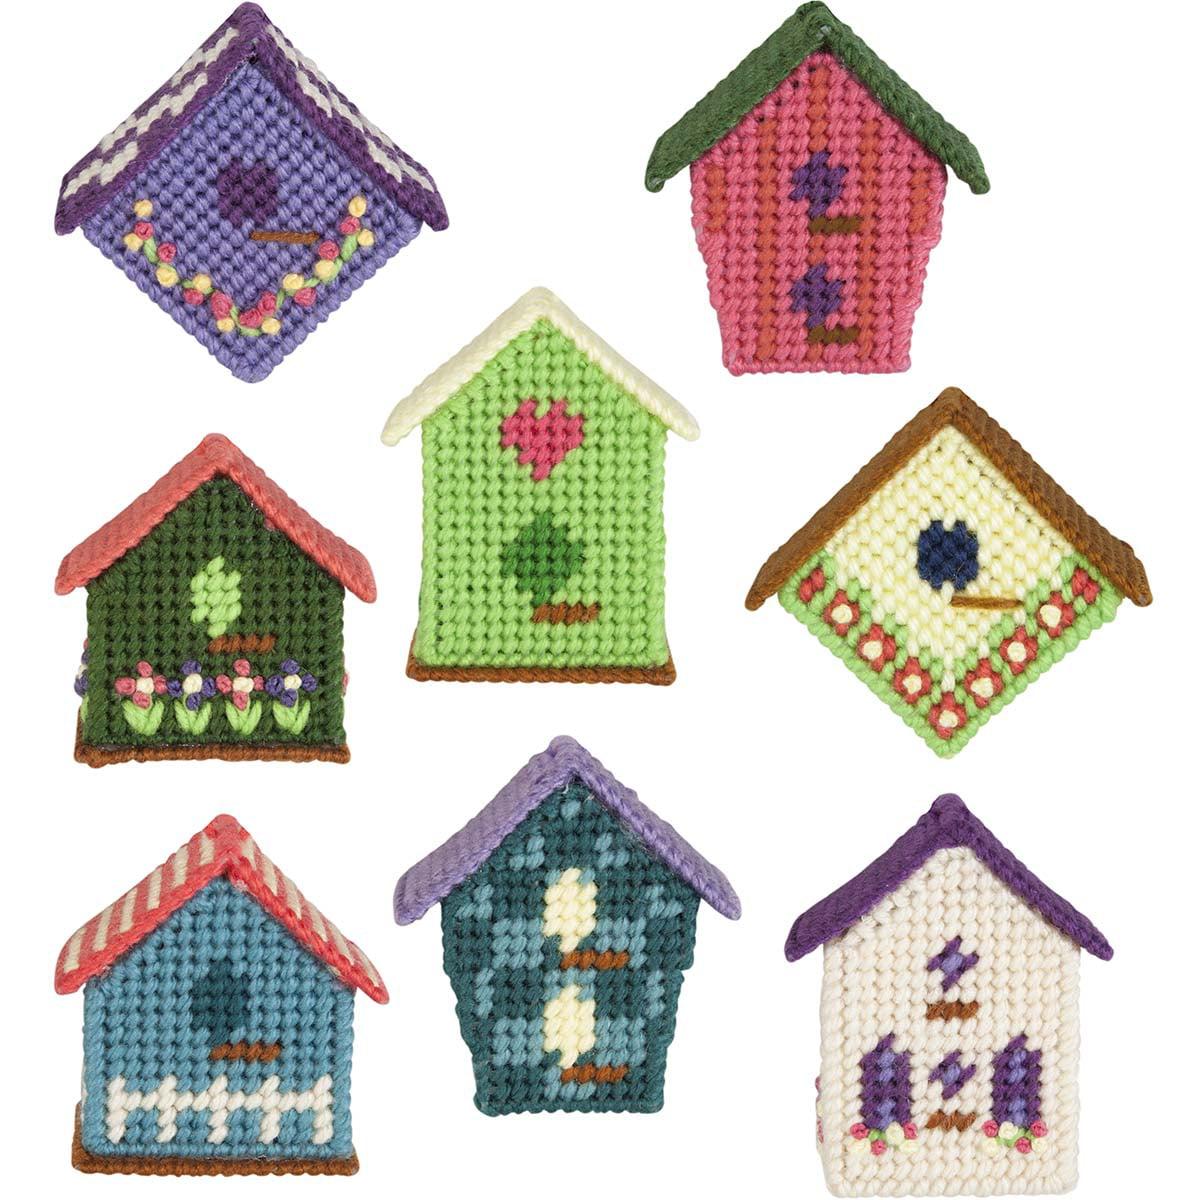 Herrschners® Bright Birdhouses Ornaments Plastic Canvas Kit